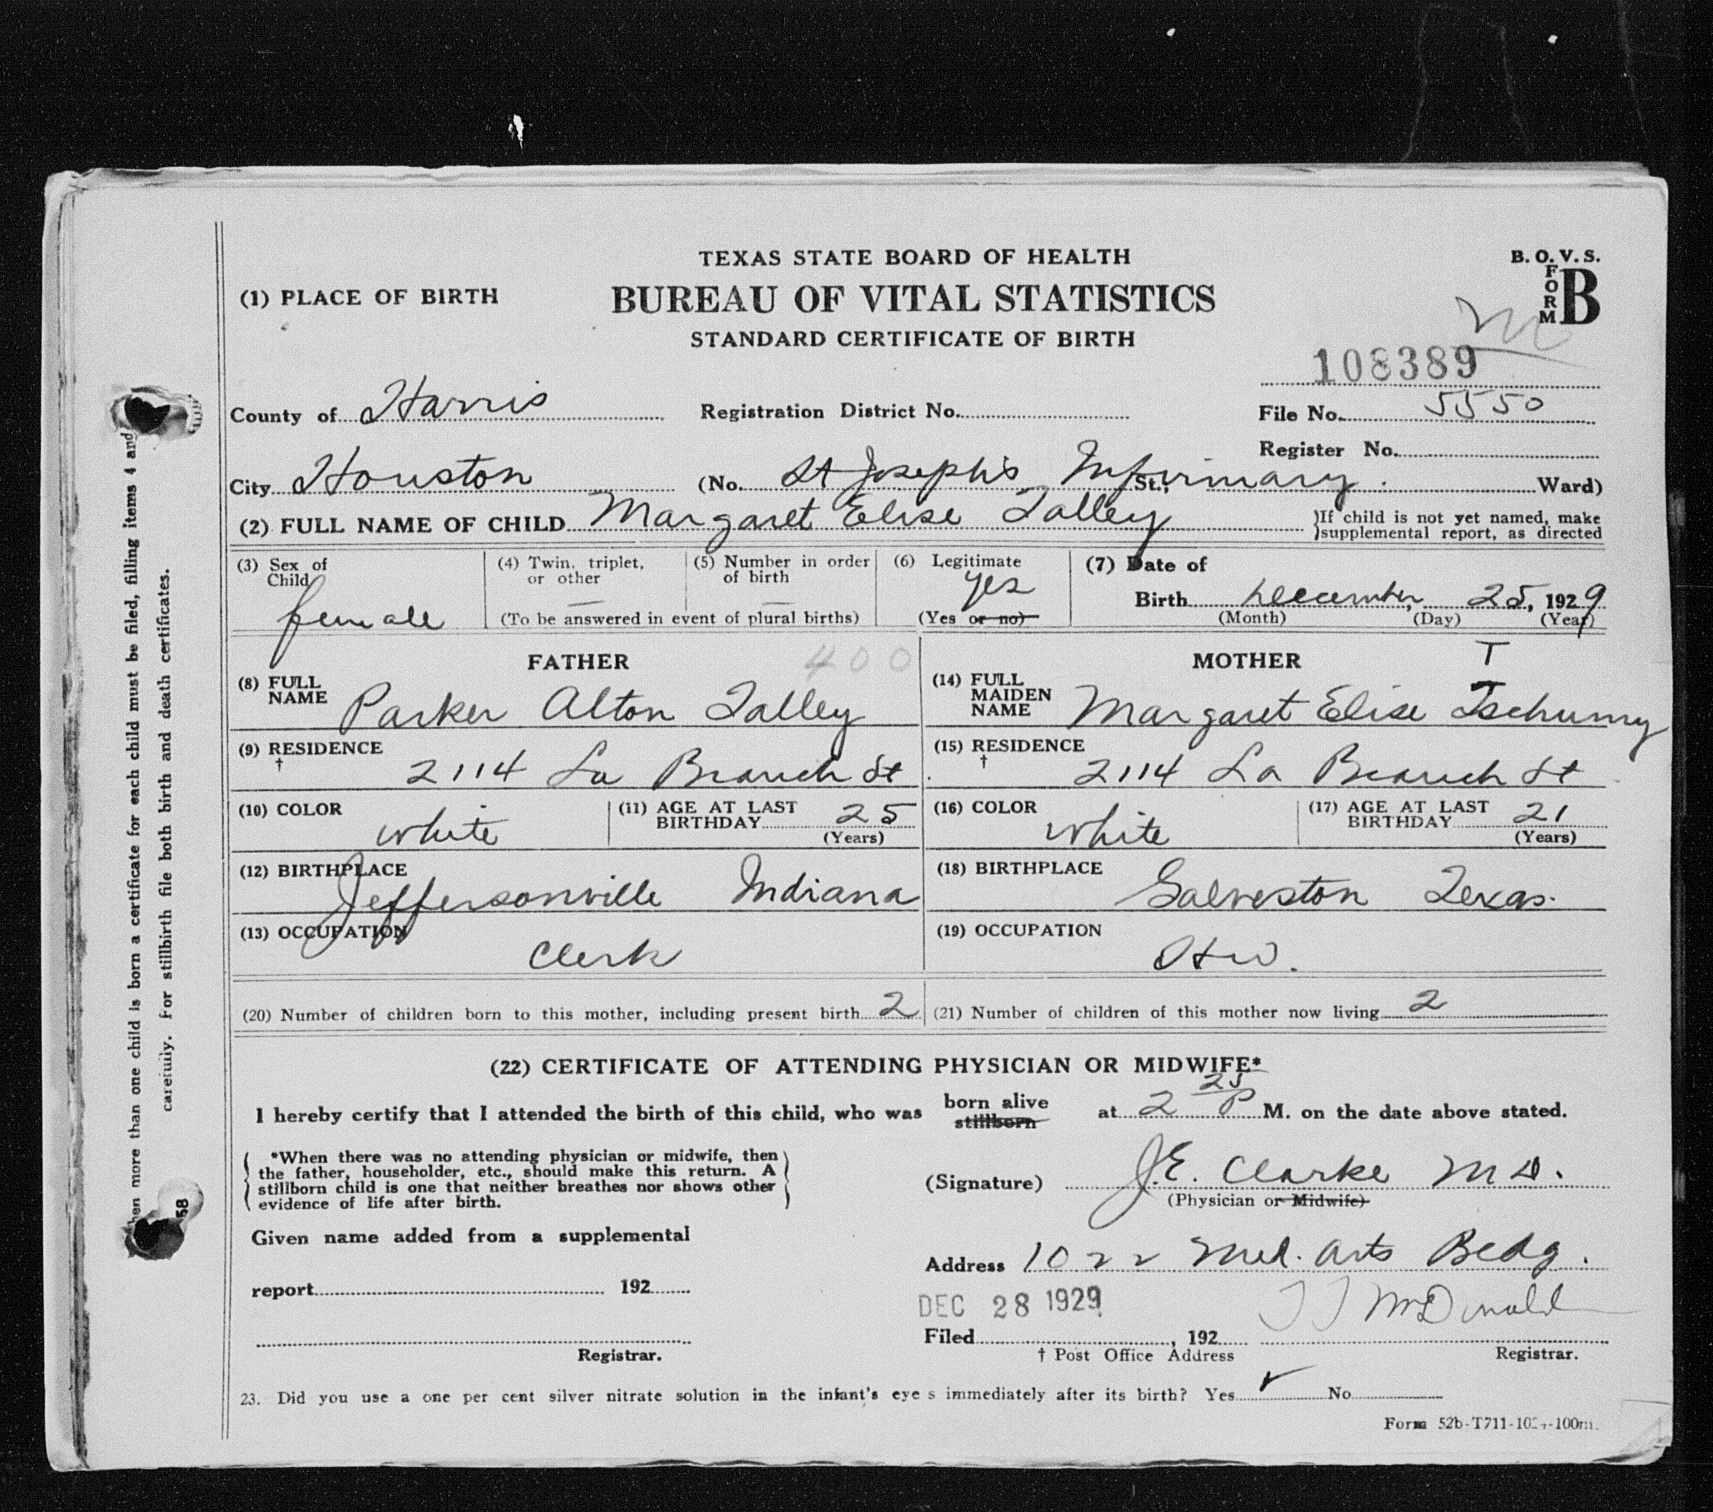 Parker alton talley jr 1938 1968 find a grave memorial tx birth certificate 108389 houston harris co tx aiddatafo Choice Image